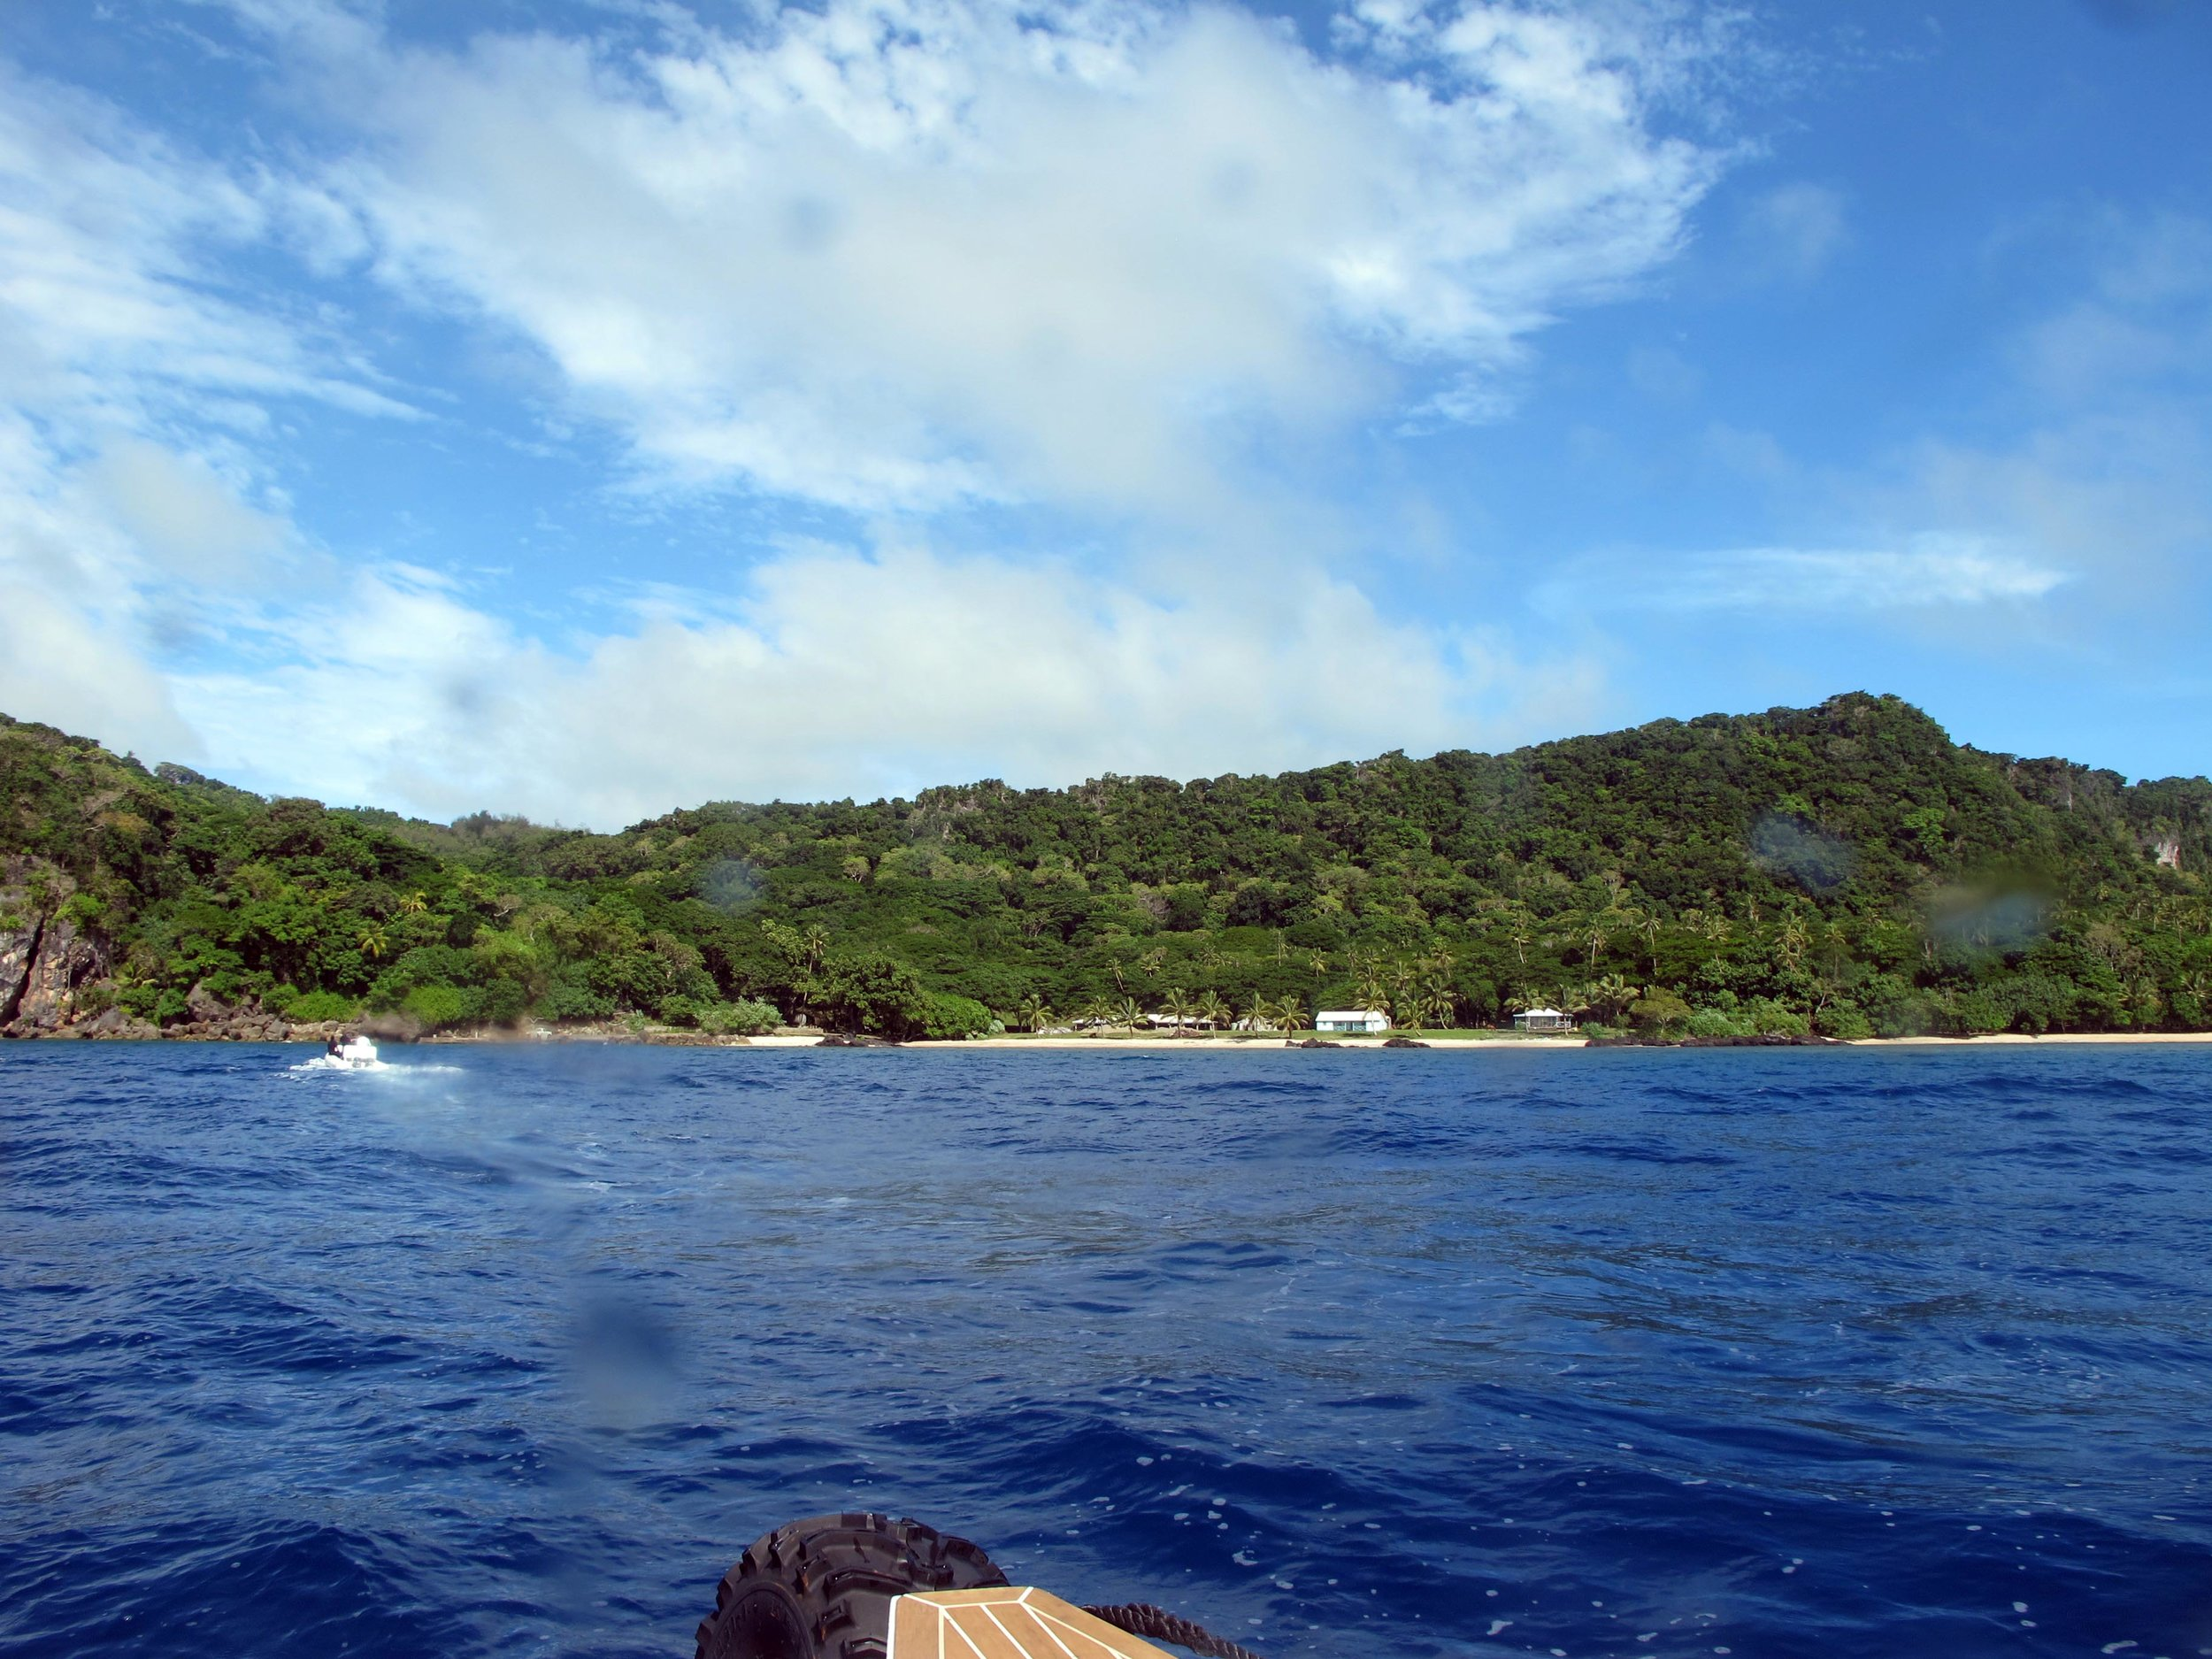 Mel Gibson's island 6-20-13.jpg